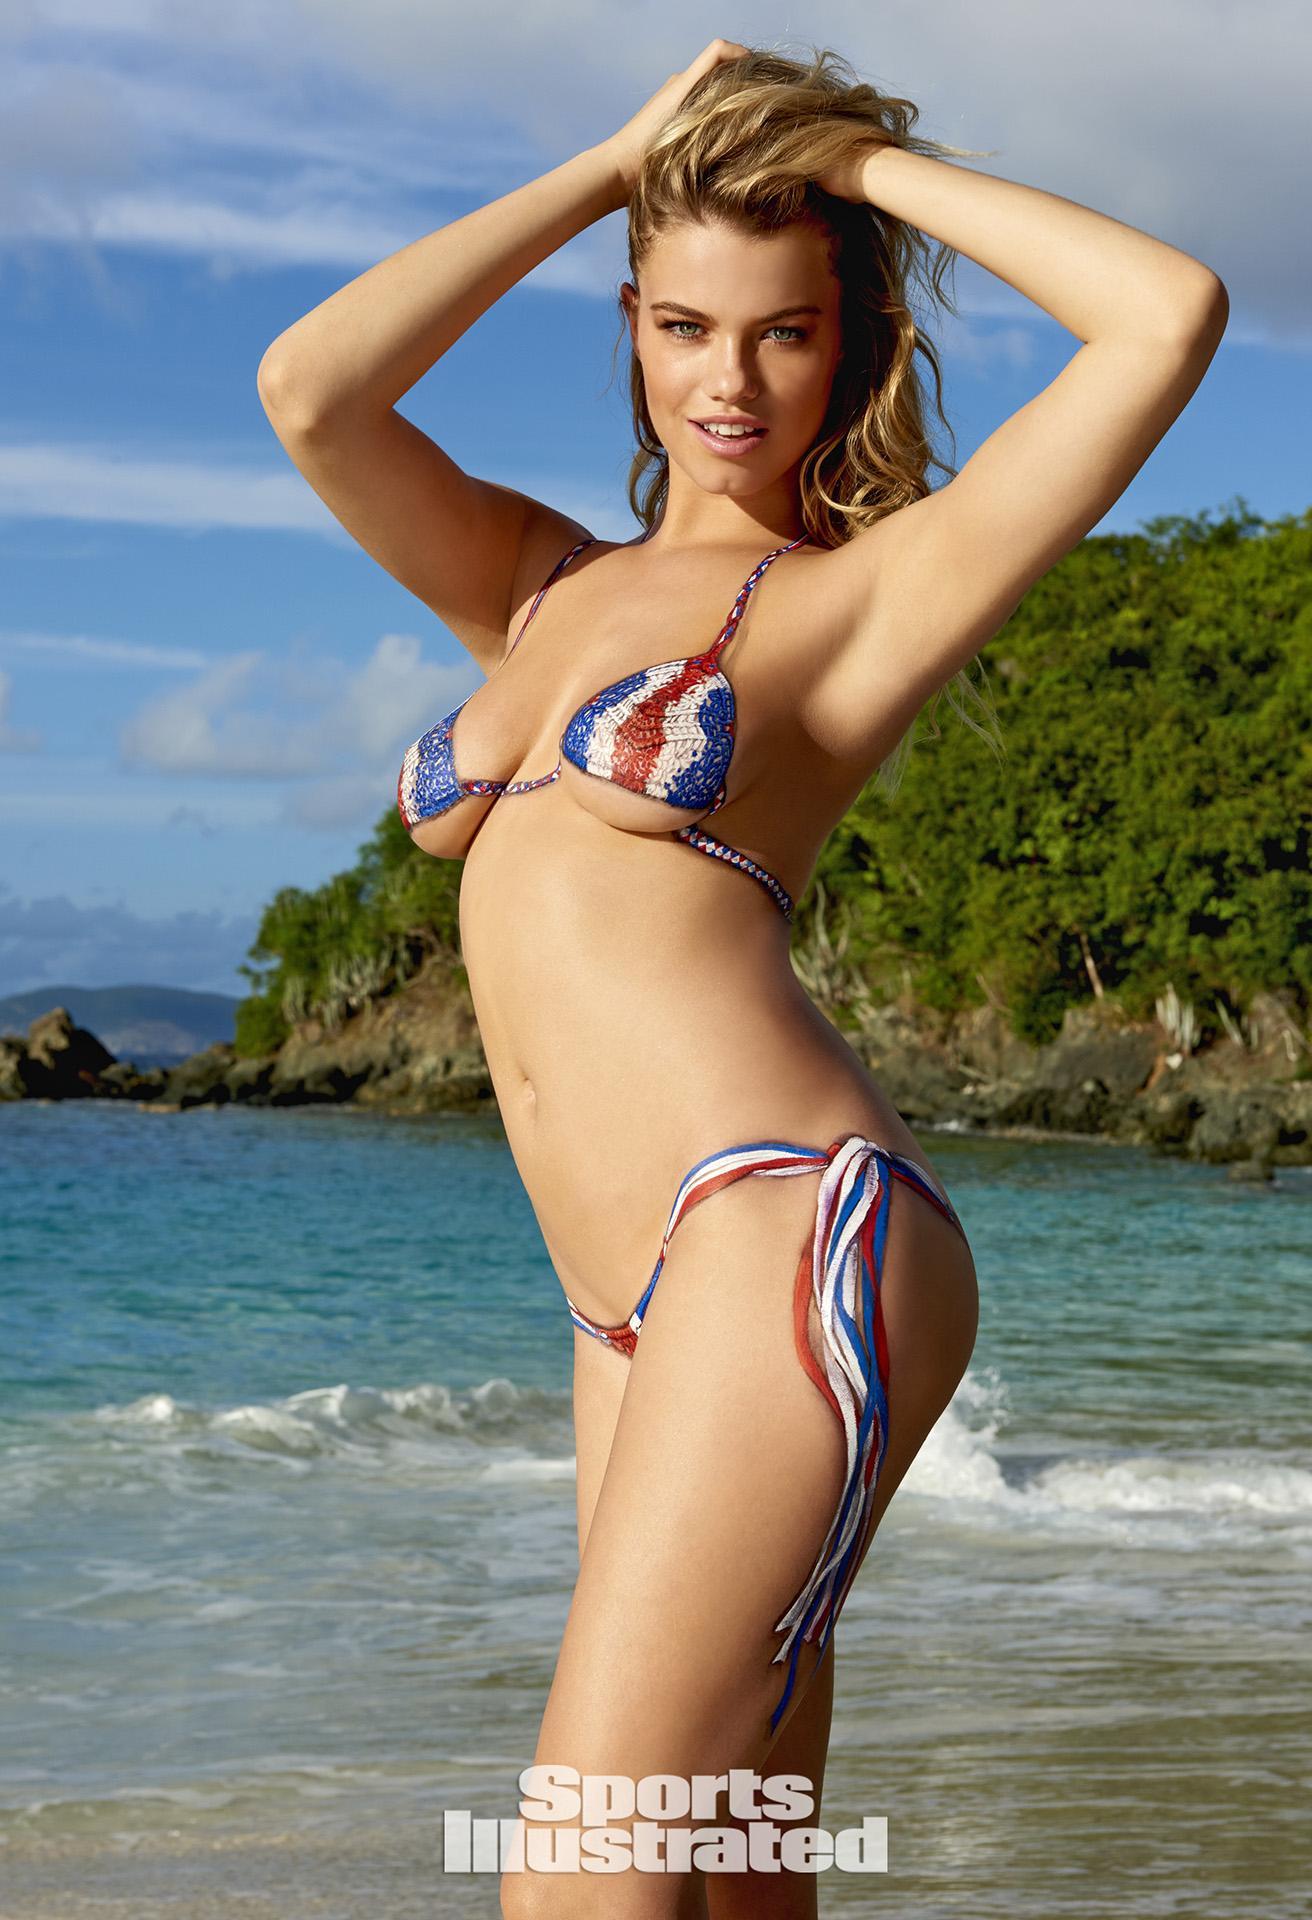 image Genevieve morton intimates si swimsuit 2017